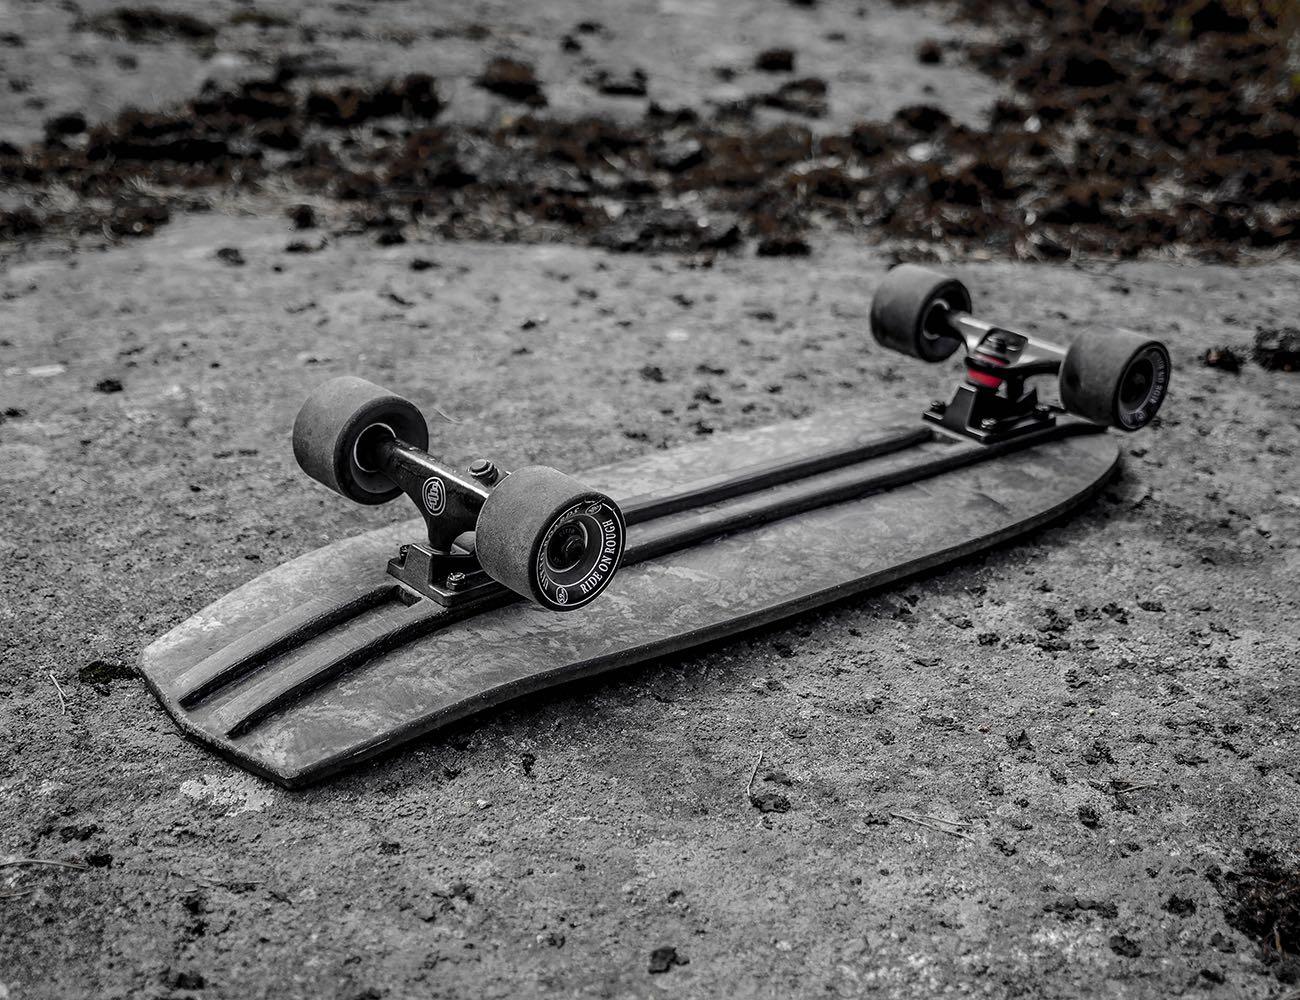 Uitto+%26%238211%3B+The+Biocomposite+Skateboard